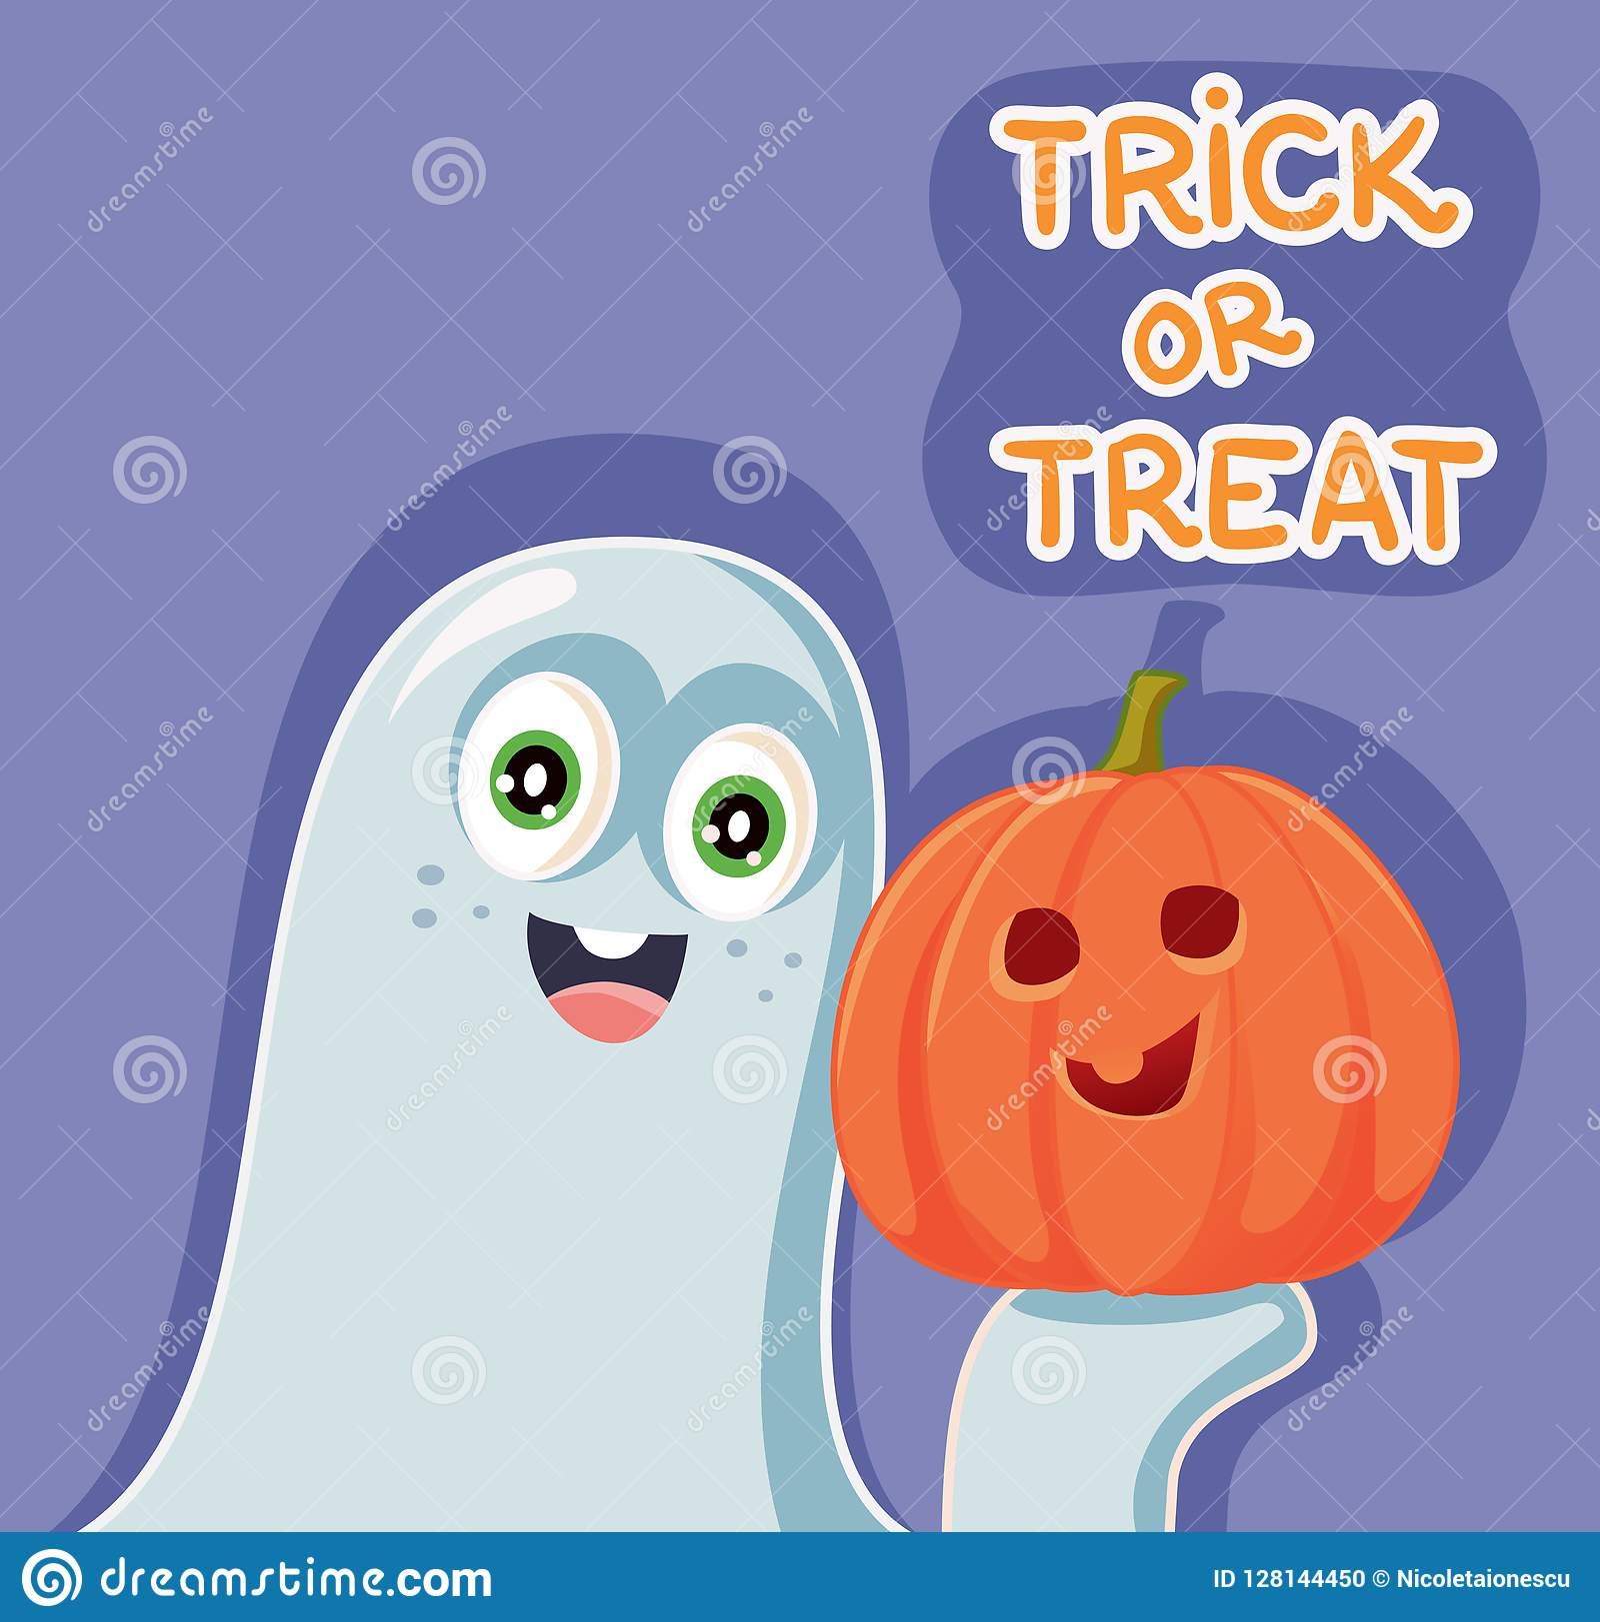 Funny Cartoon Halloween Ghost With Pumpkin Stock Vector